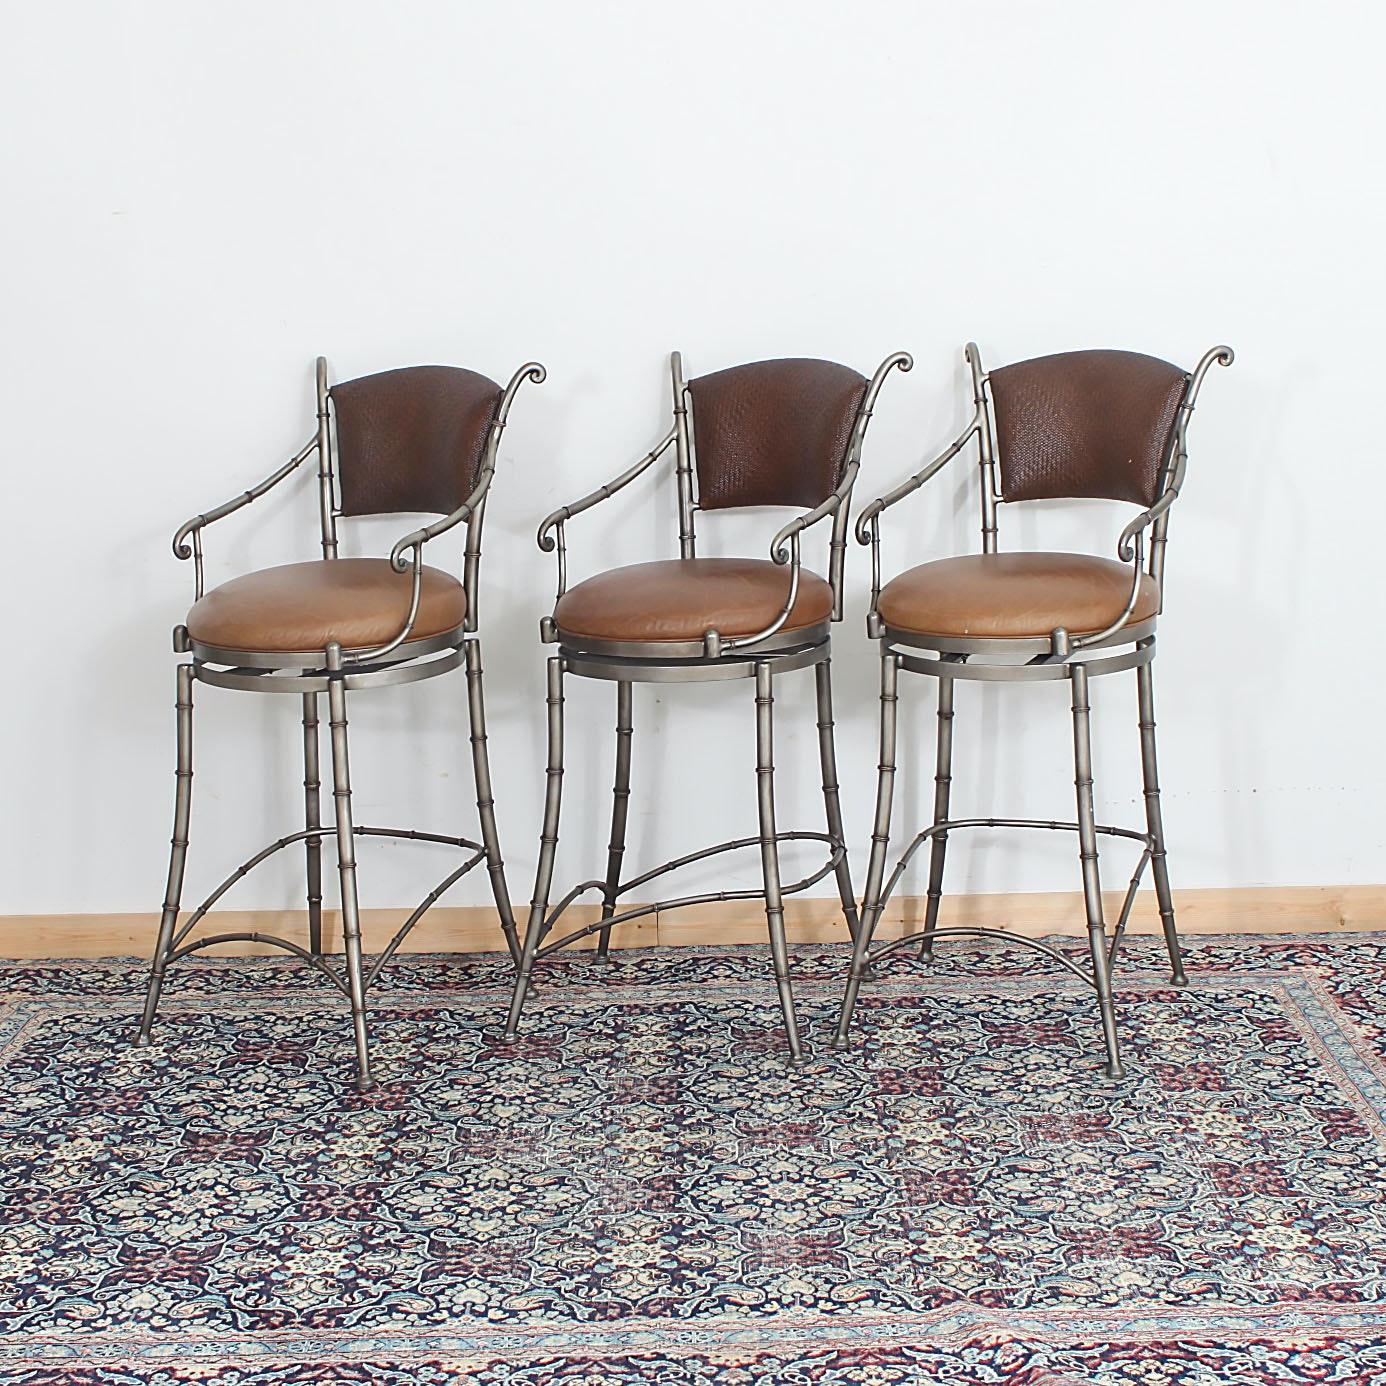 Three Contemporary Counter Stools